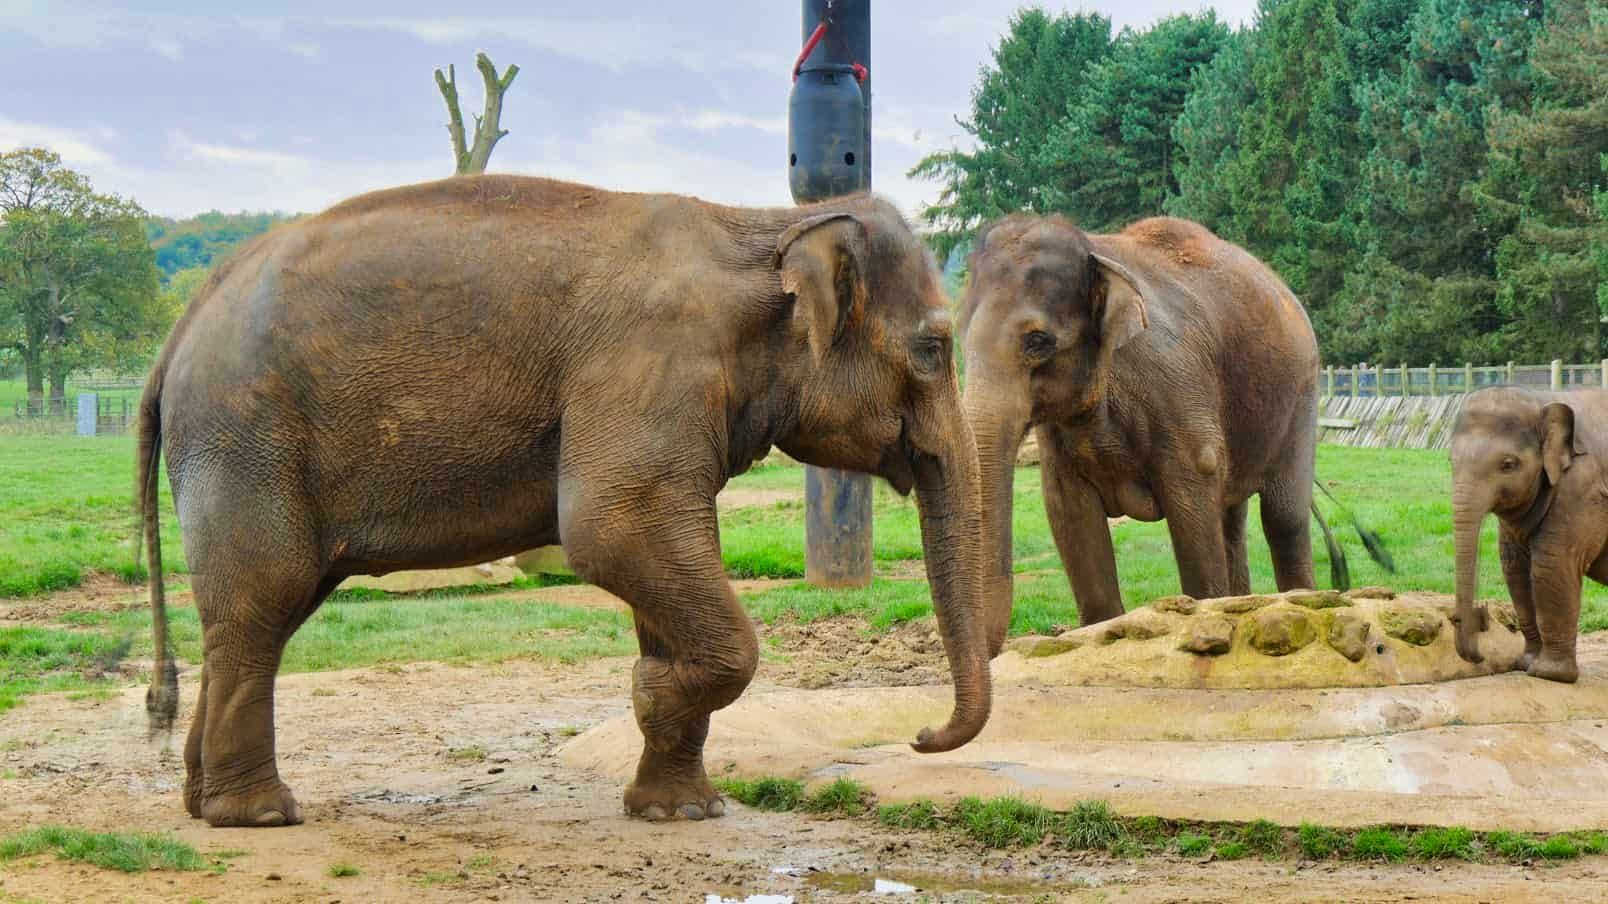 An elephant standing on three legs